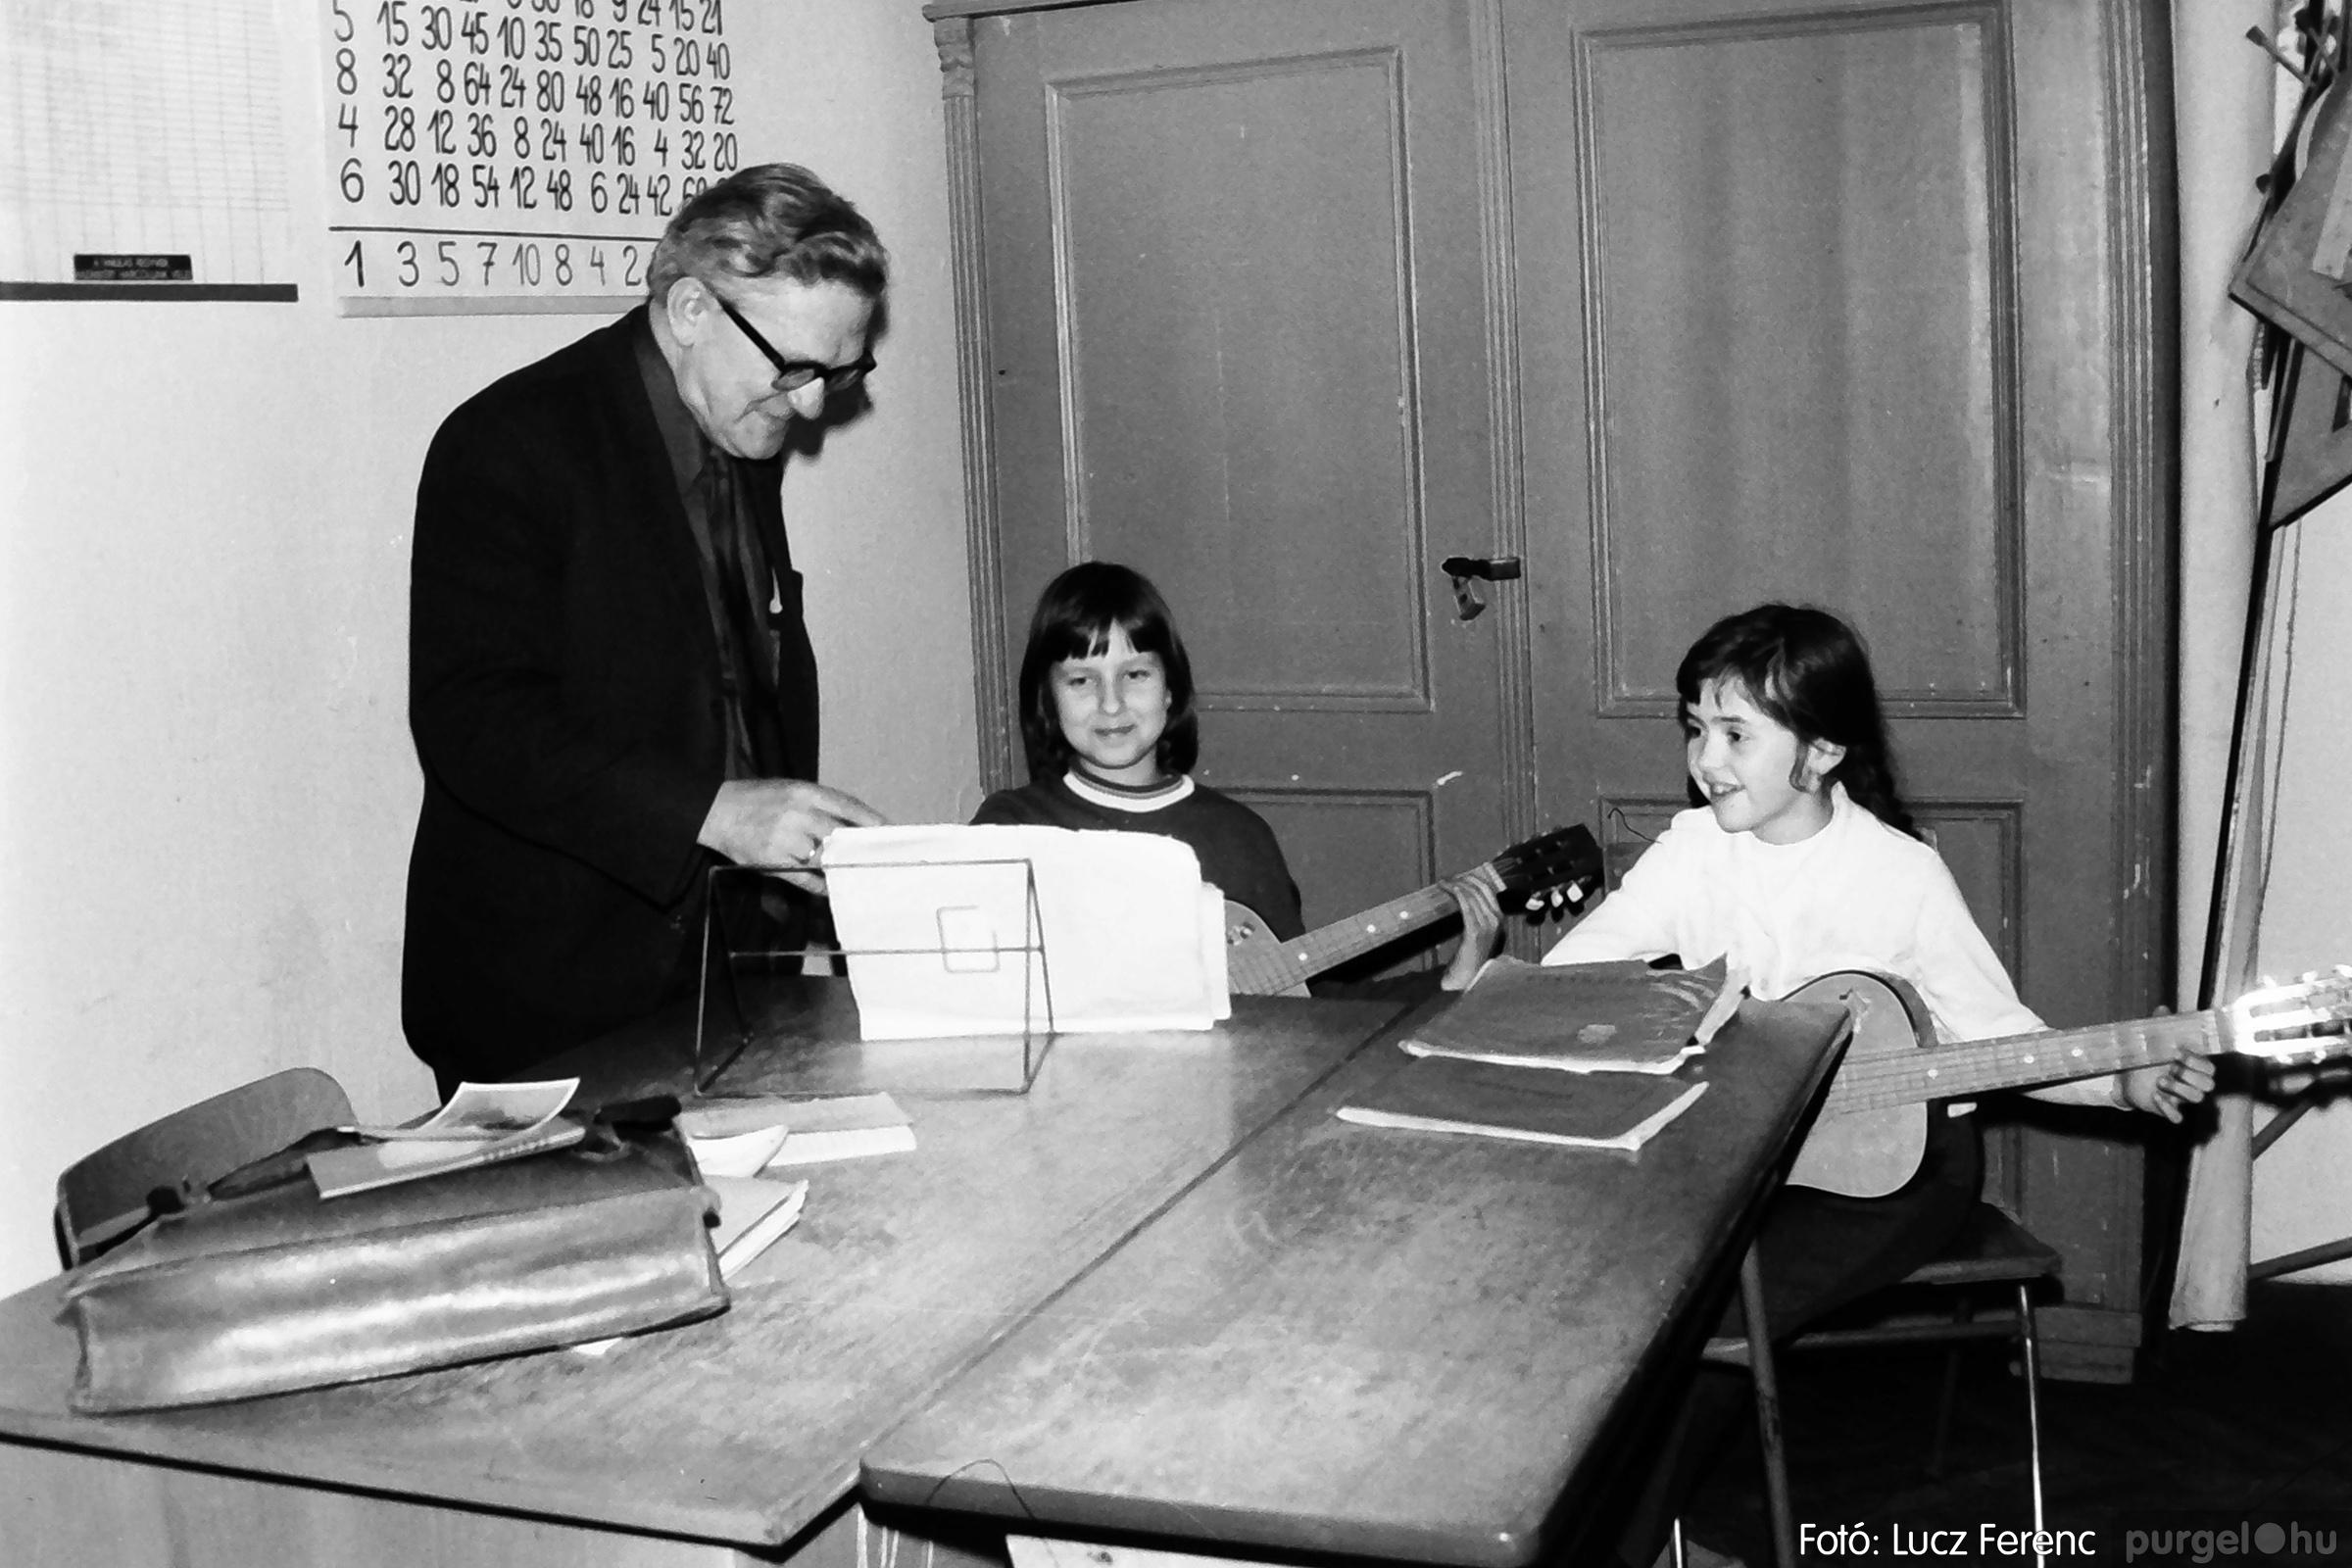 074. 1977. Farsang a gyermekotthonban 013. - Fotó: Lucz Ferenc.jpg